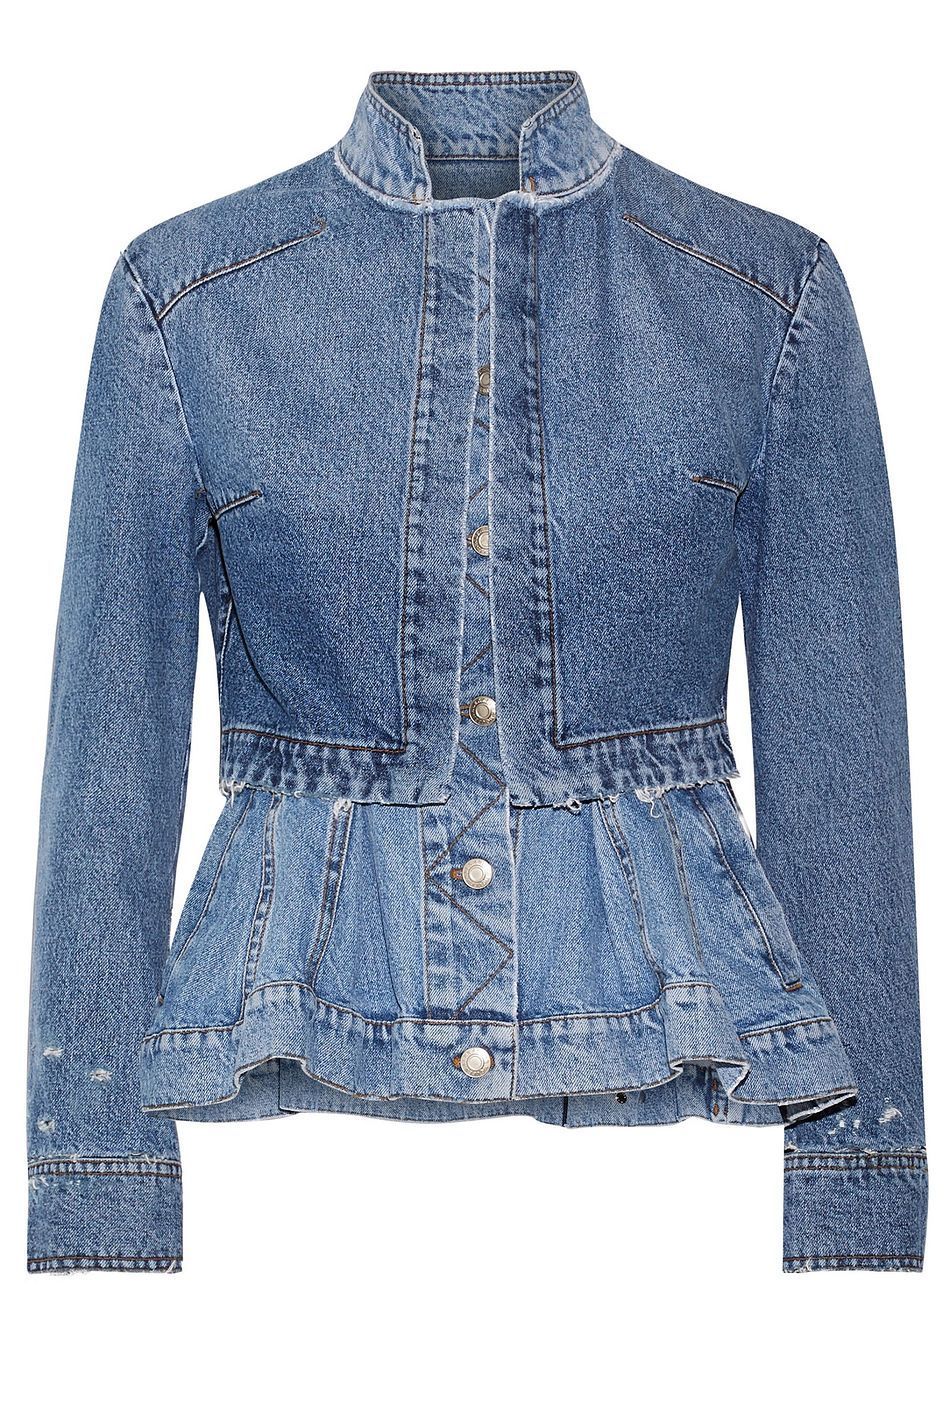 Mid Denim Layered Denim Peplum Jacket Sale Up To 70 Off The Outnet Alexander Mcqueen Peplum Jacket Denim Fashion Denim Jacket Women [ 1425 x 950 Pixel ]